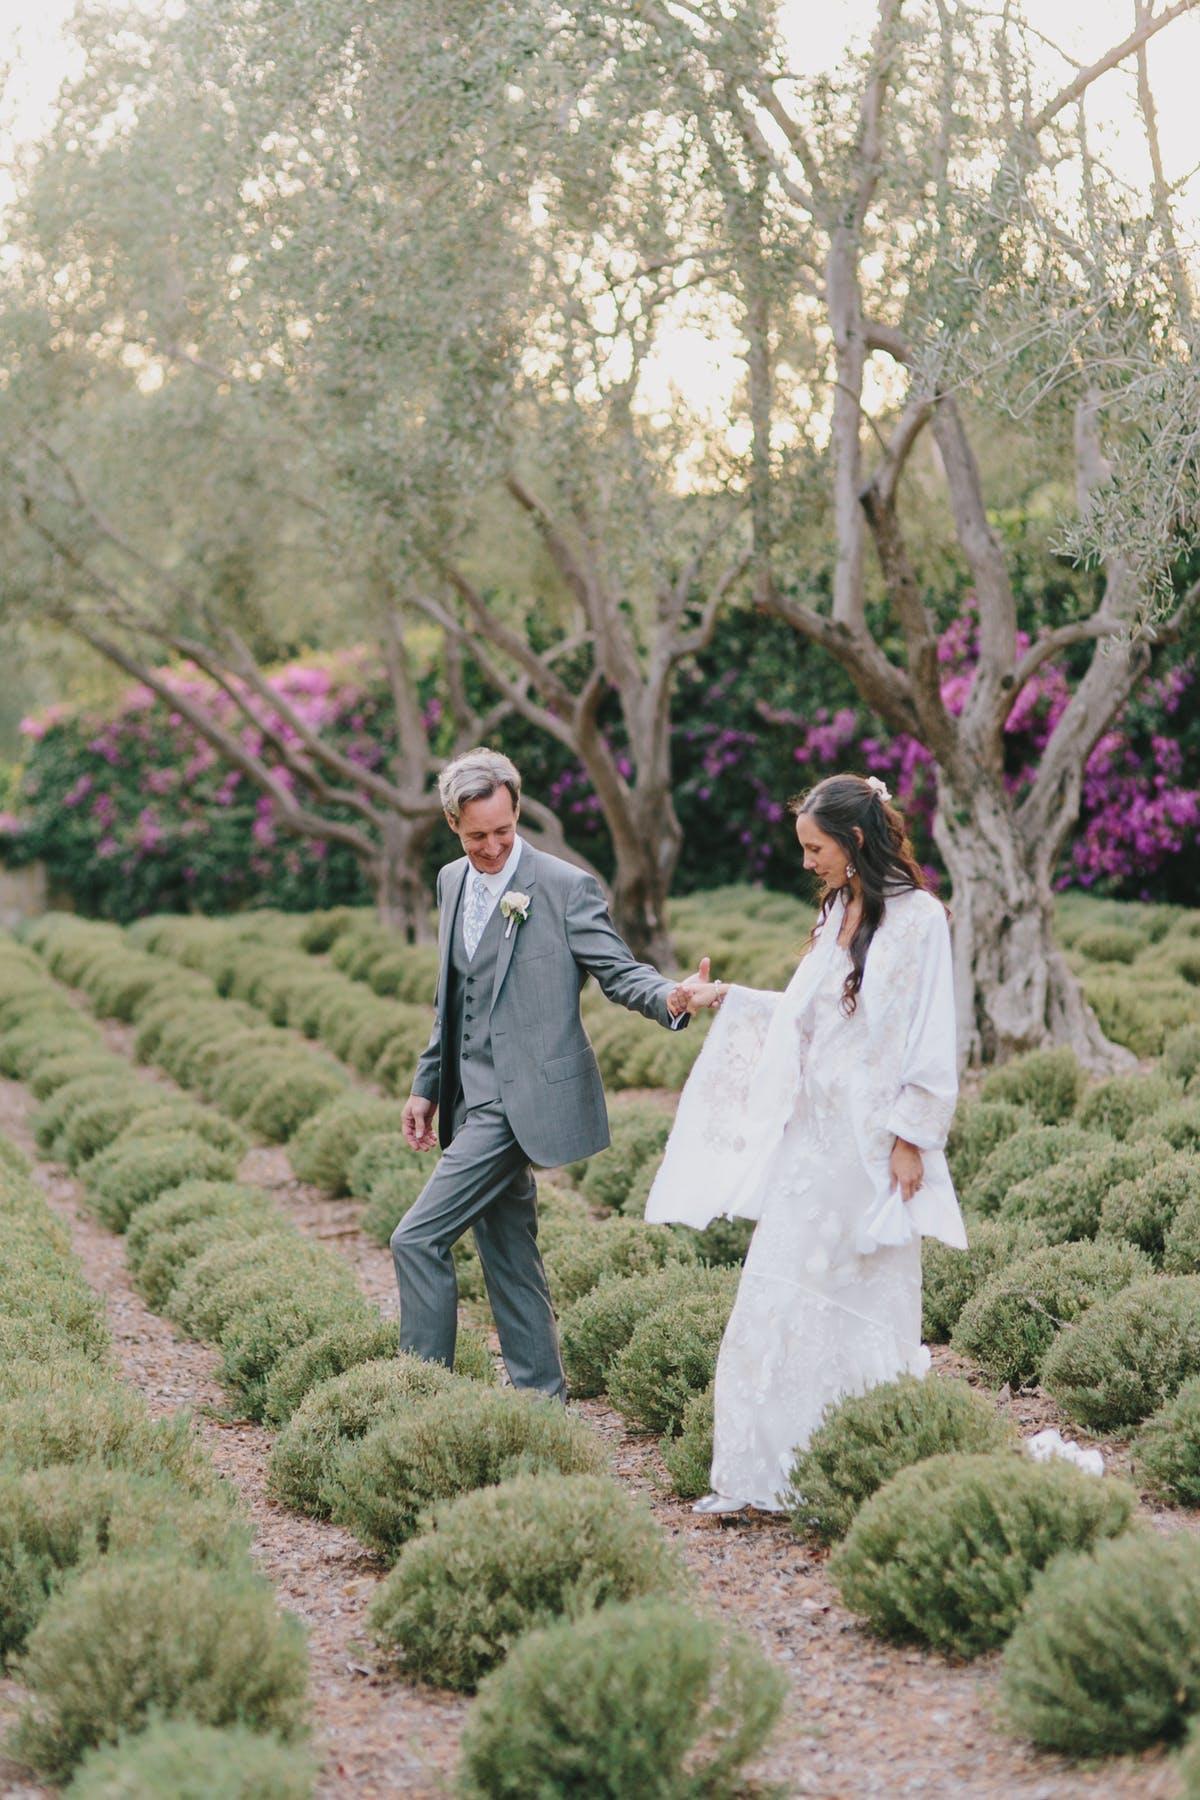 www.santabarbarawedding.com | San Ysidro Ranch | Alegria by Design | Jake + Necia Photography | Bride and Groom